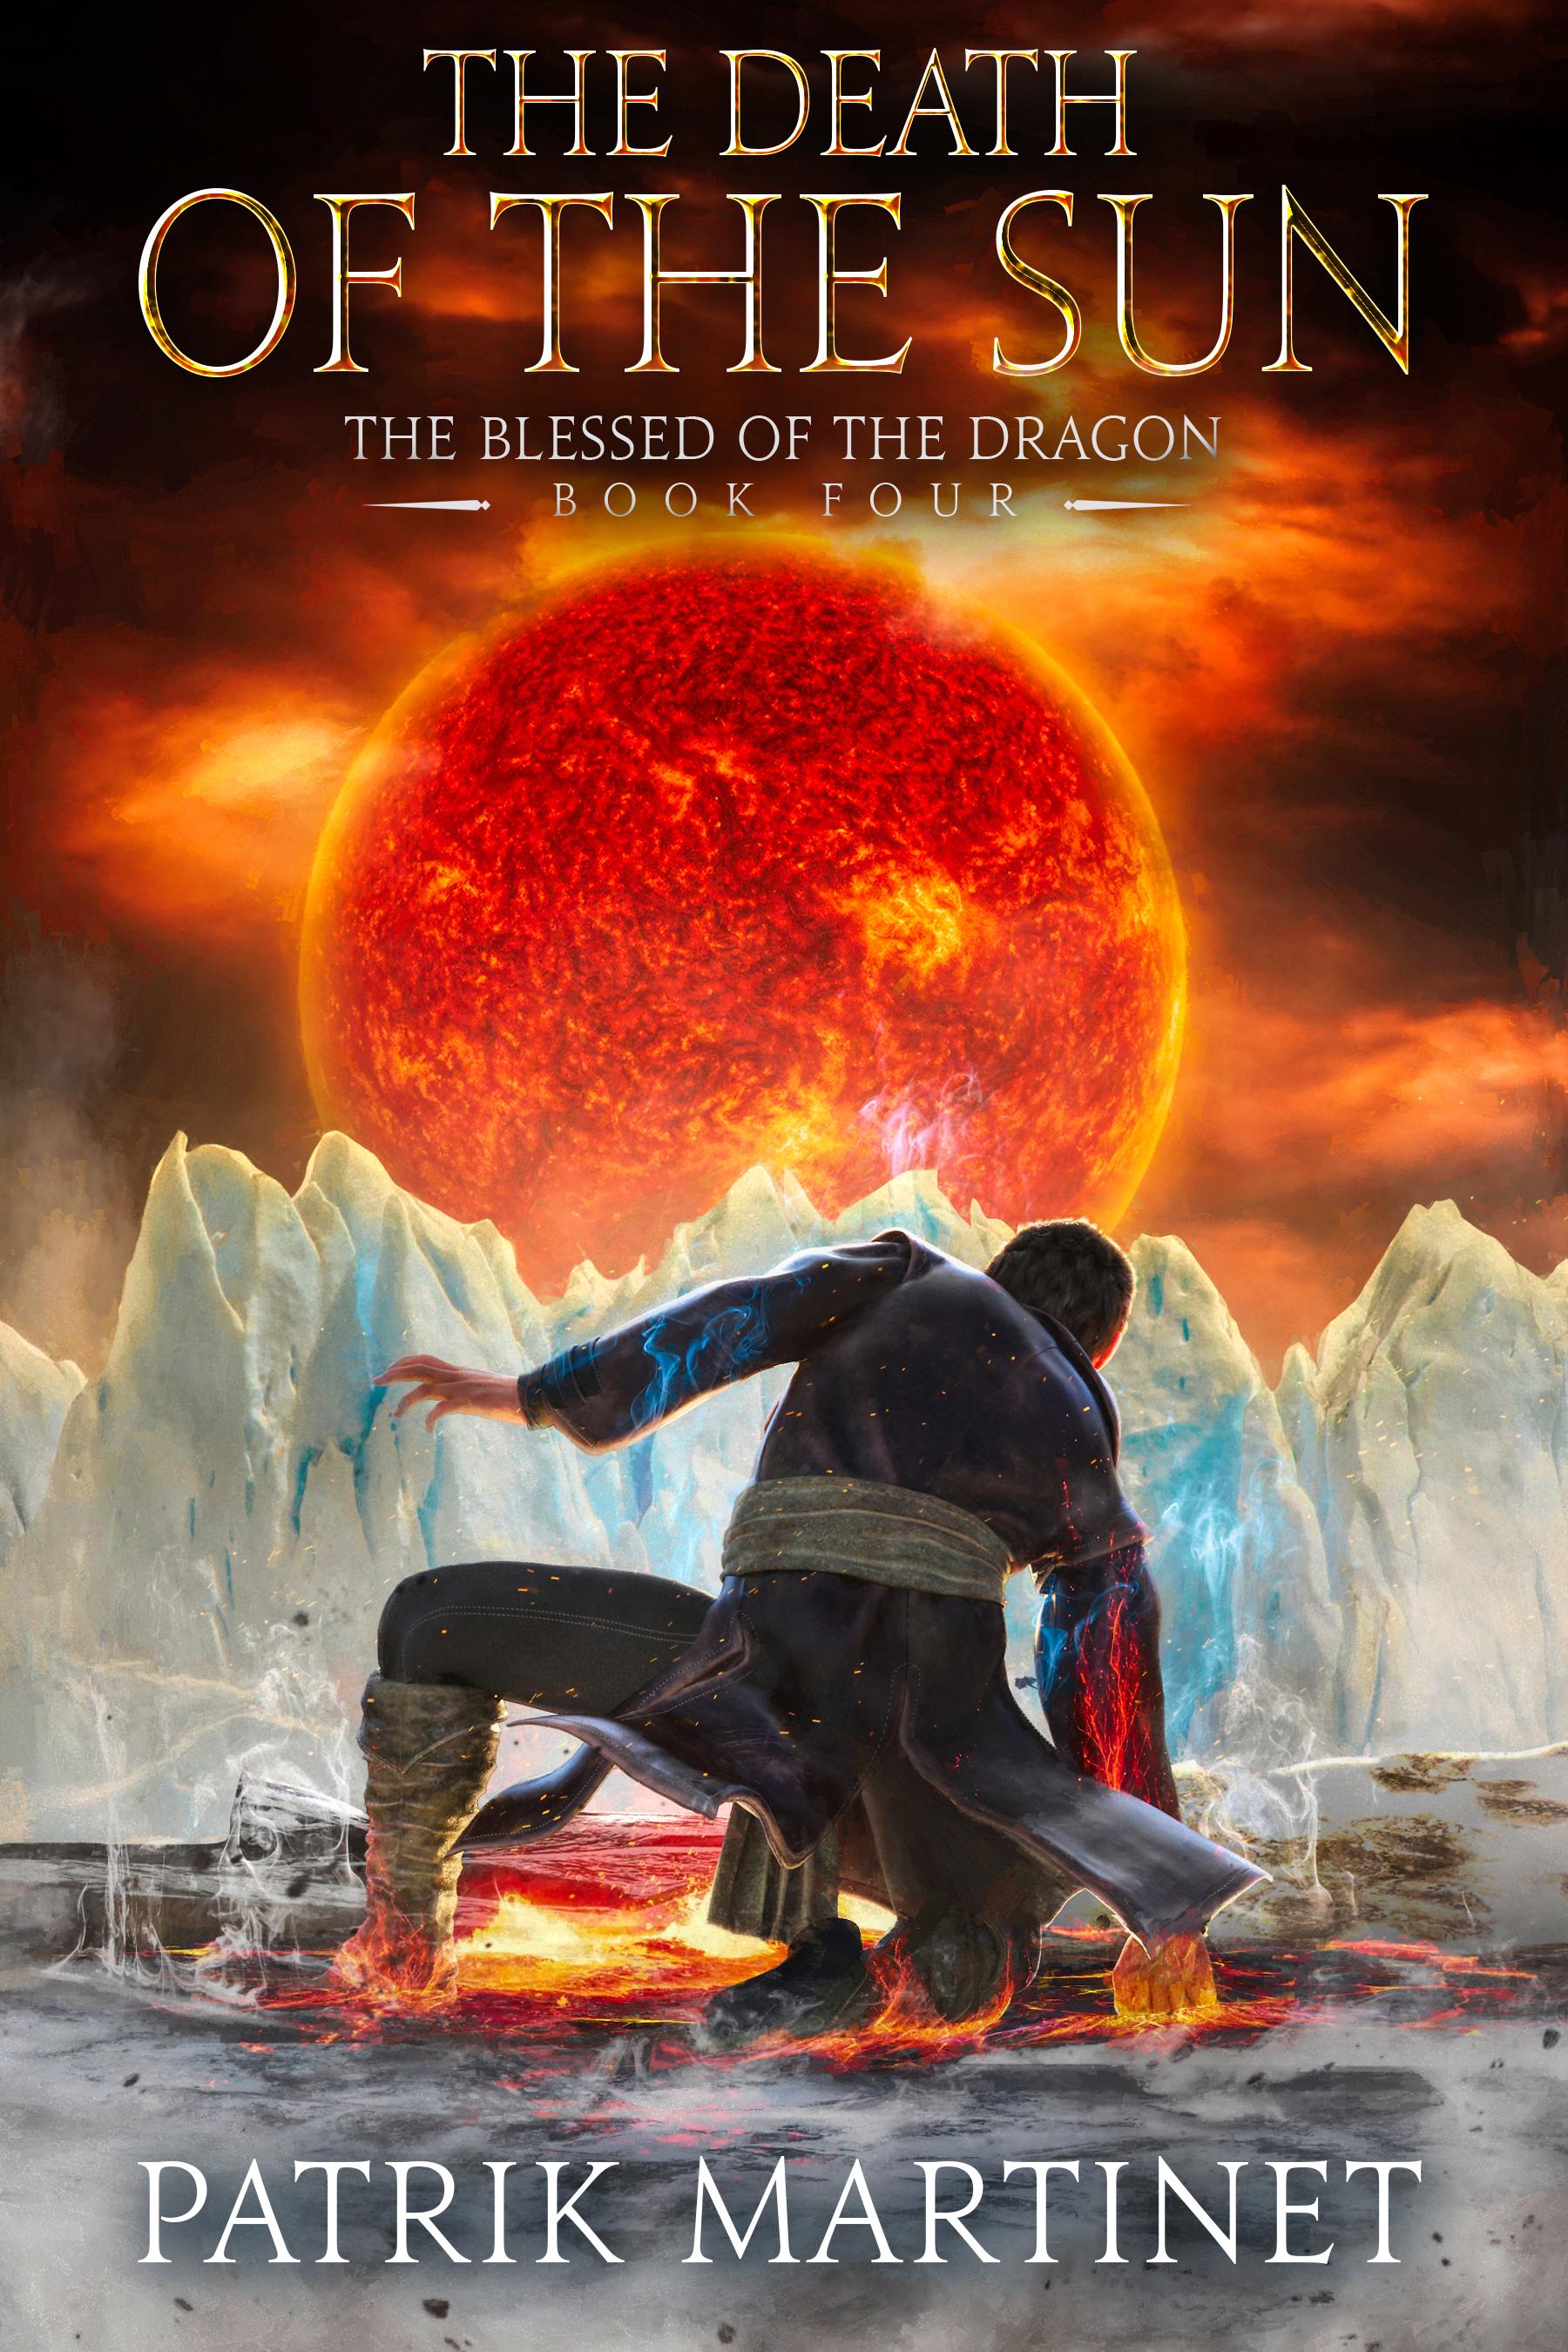 The Death of the Sun